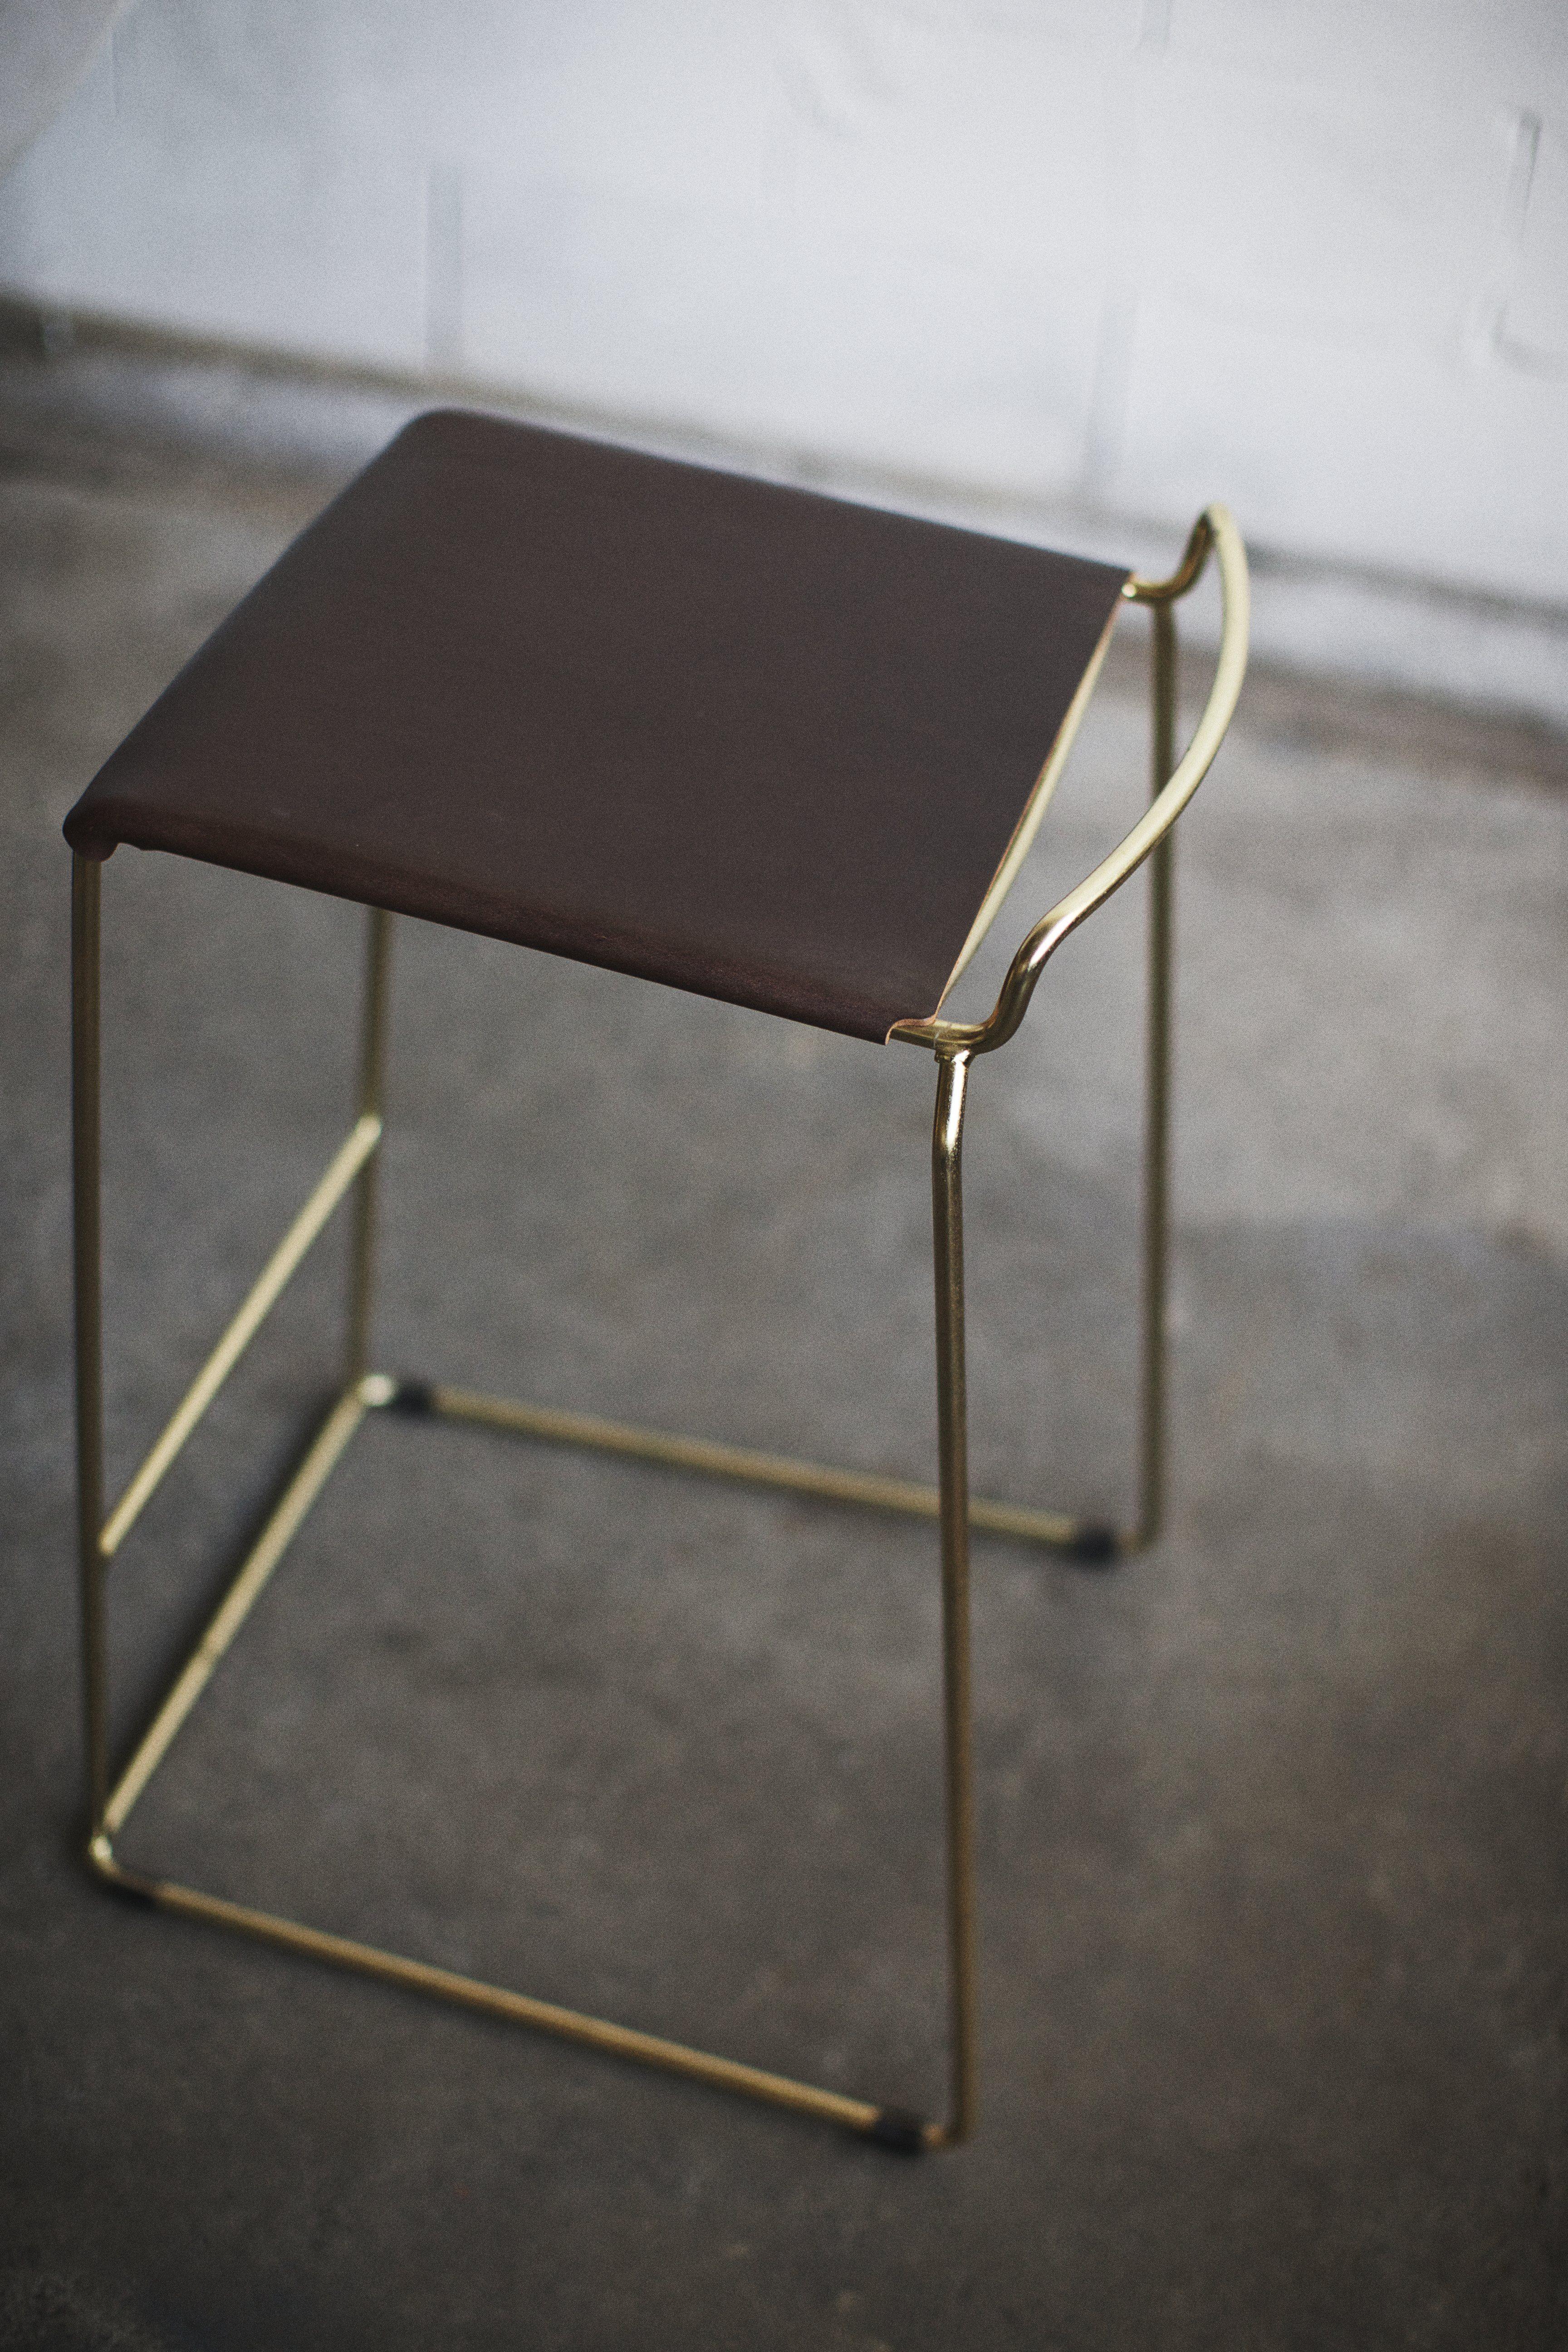 Kitchen bench stool | Armchair & Stool | Pinterest | Kitchen benches ...